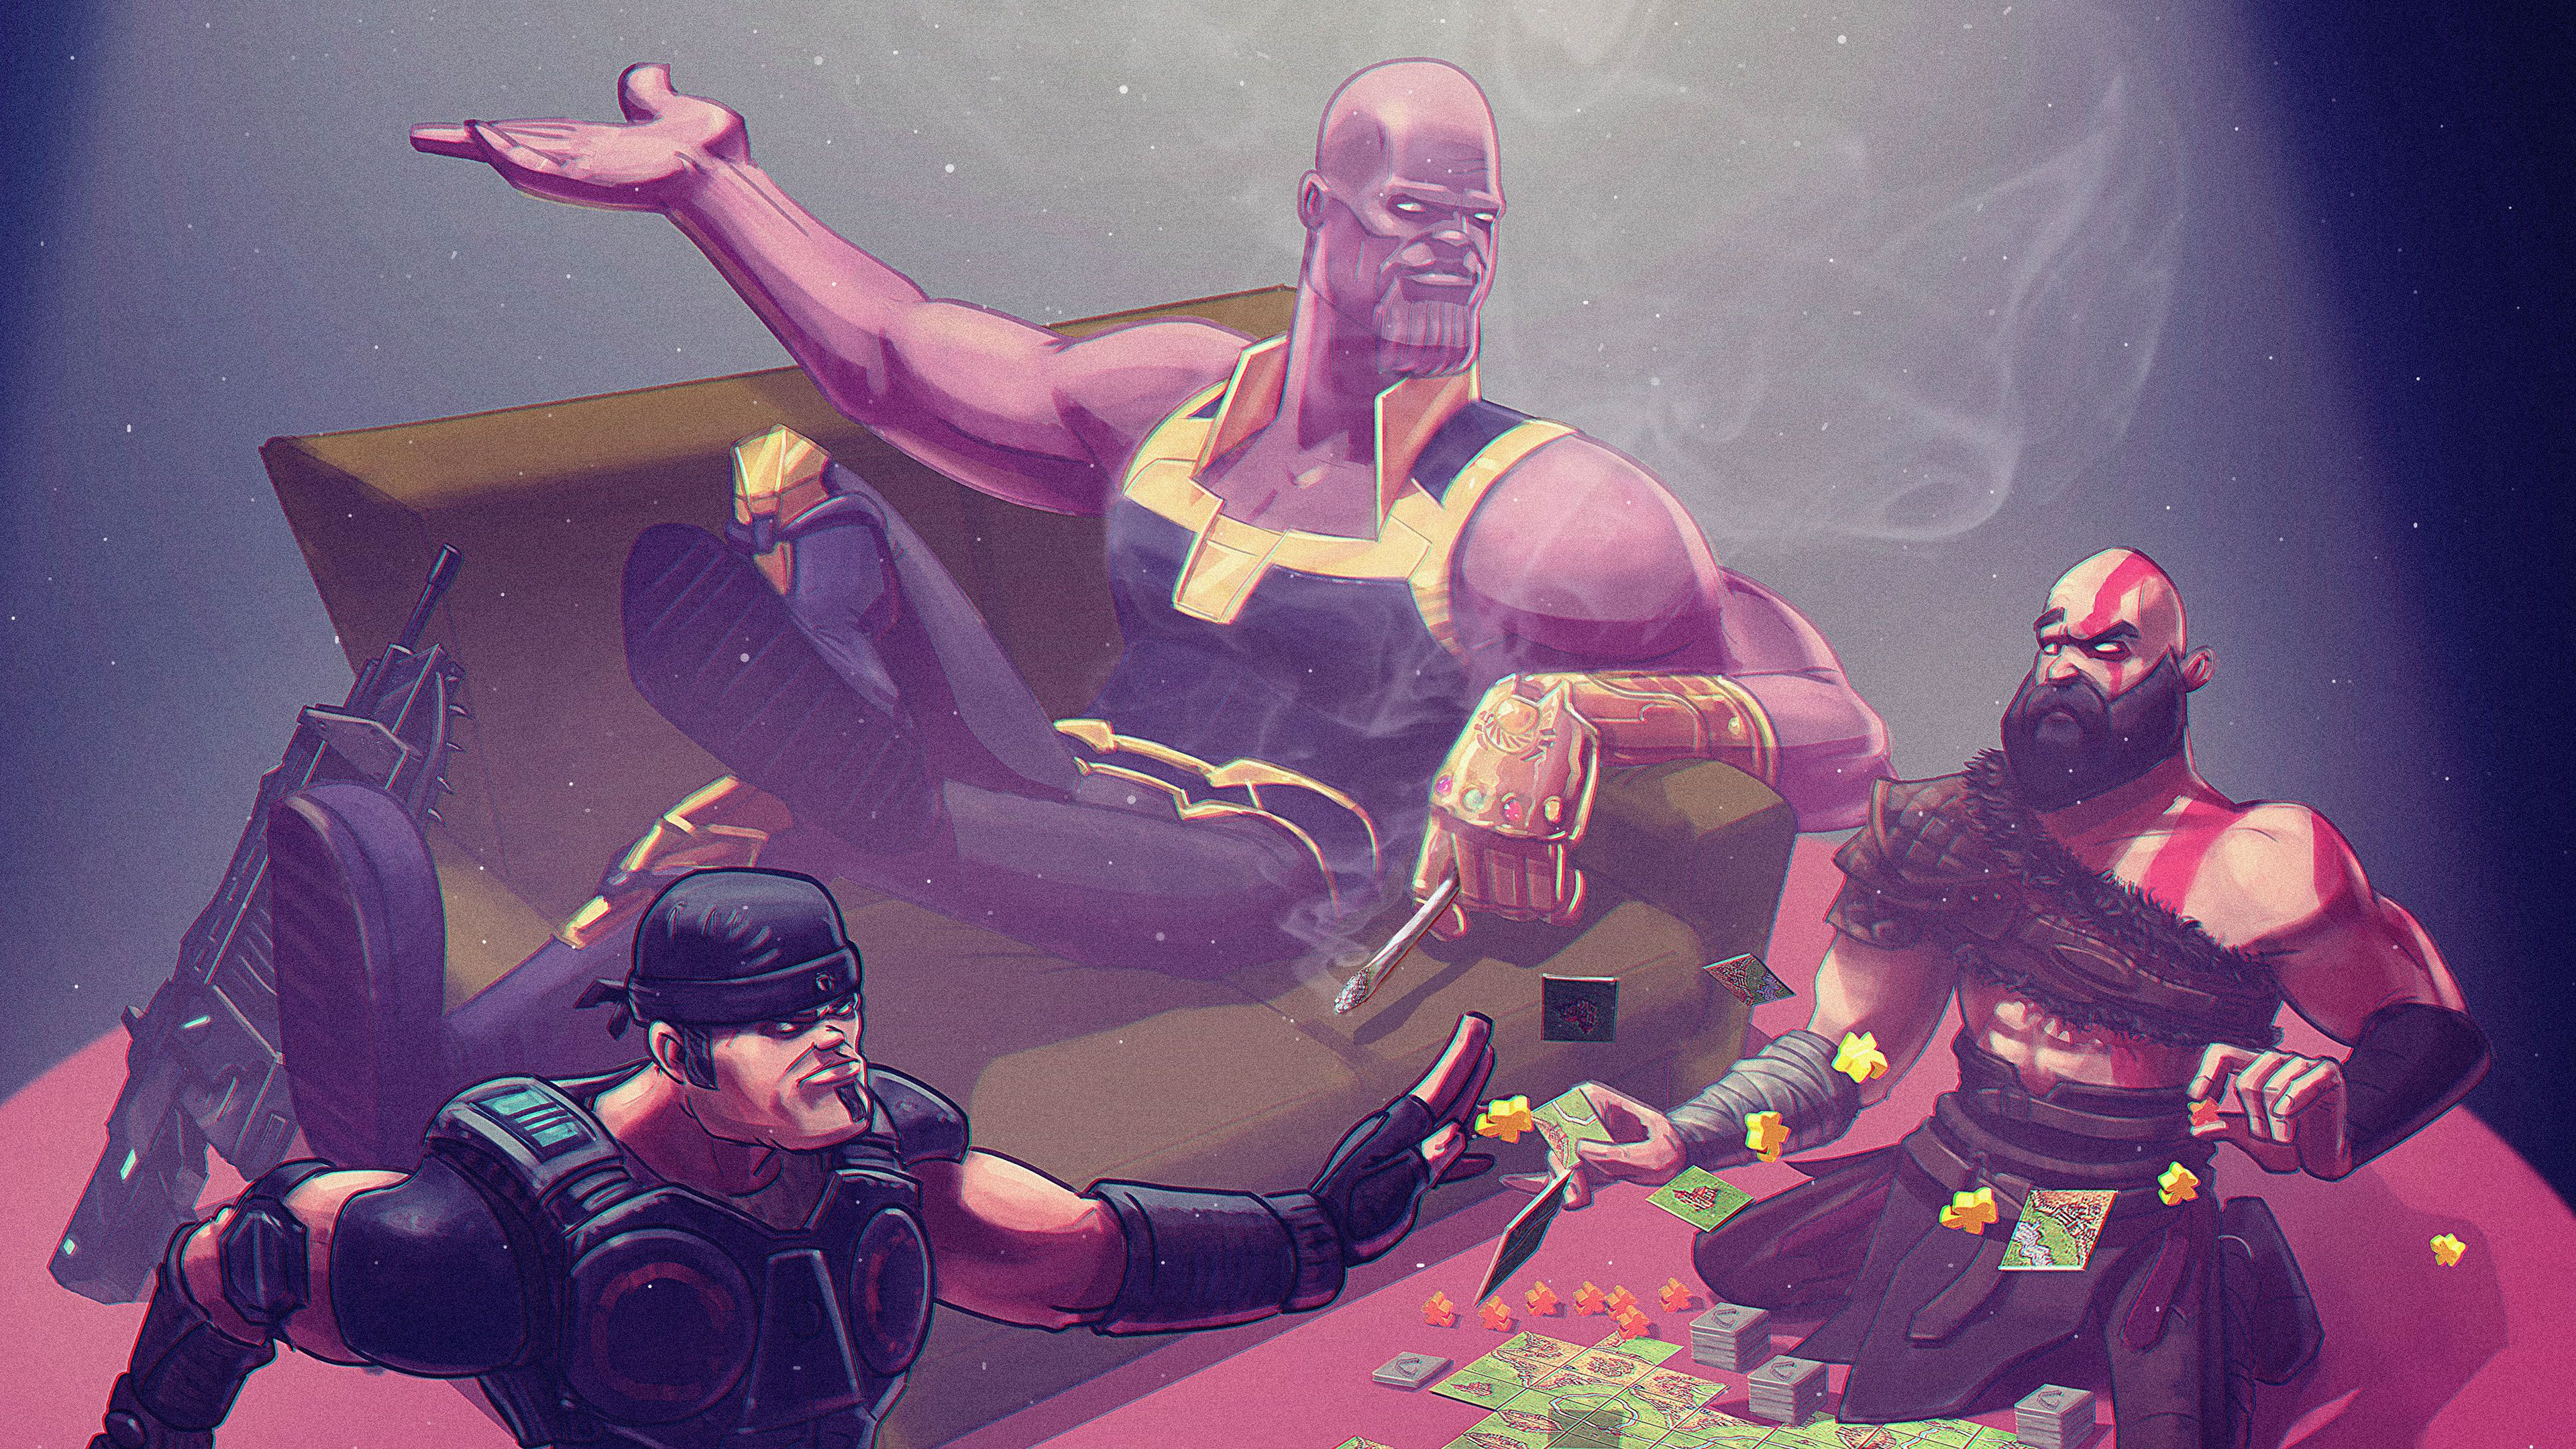 Thanos Kratos 4k thanoswallpapers, superheroes wallpapers